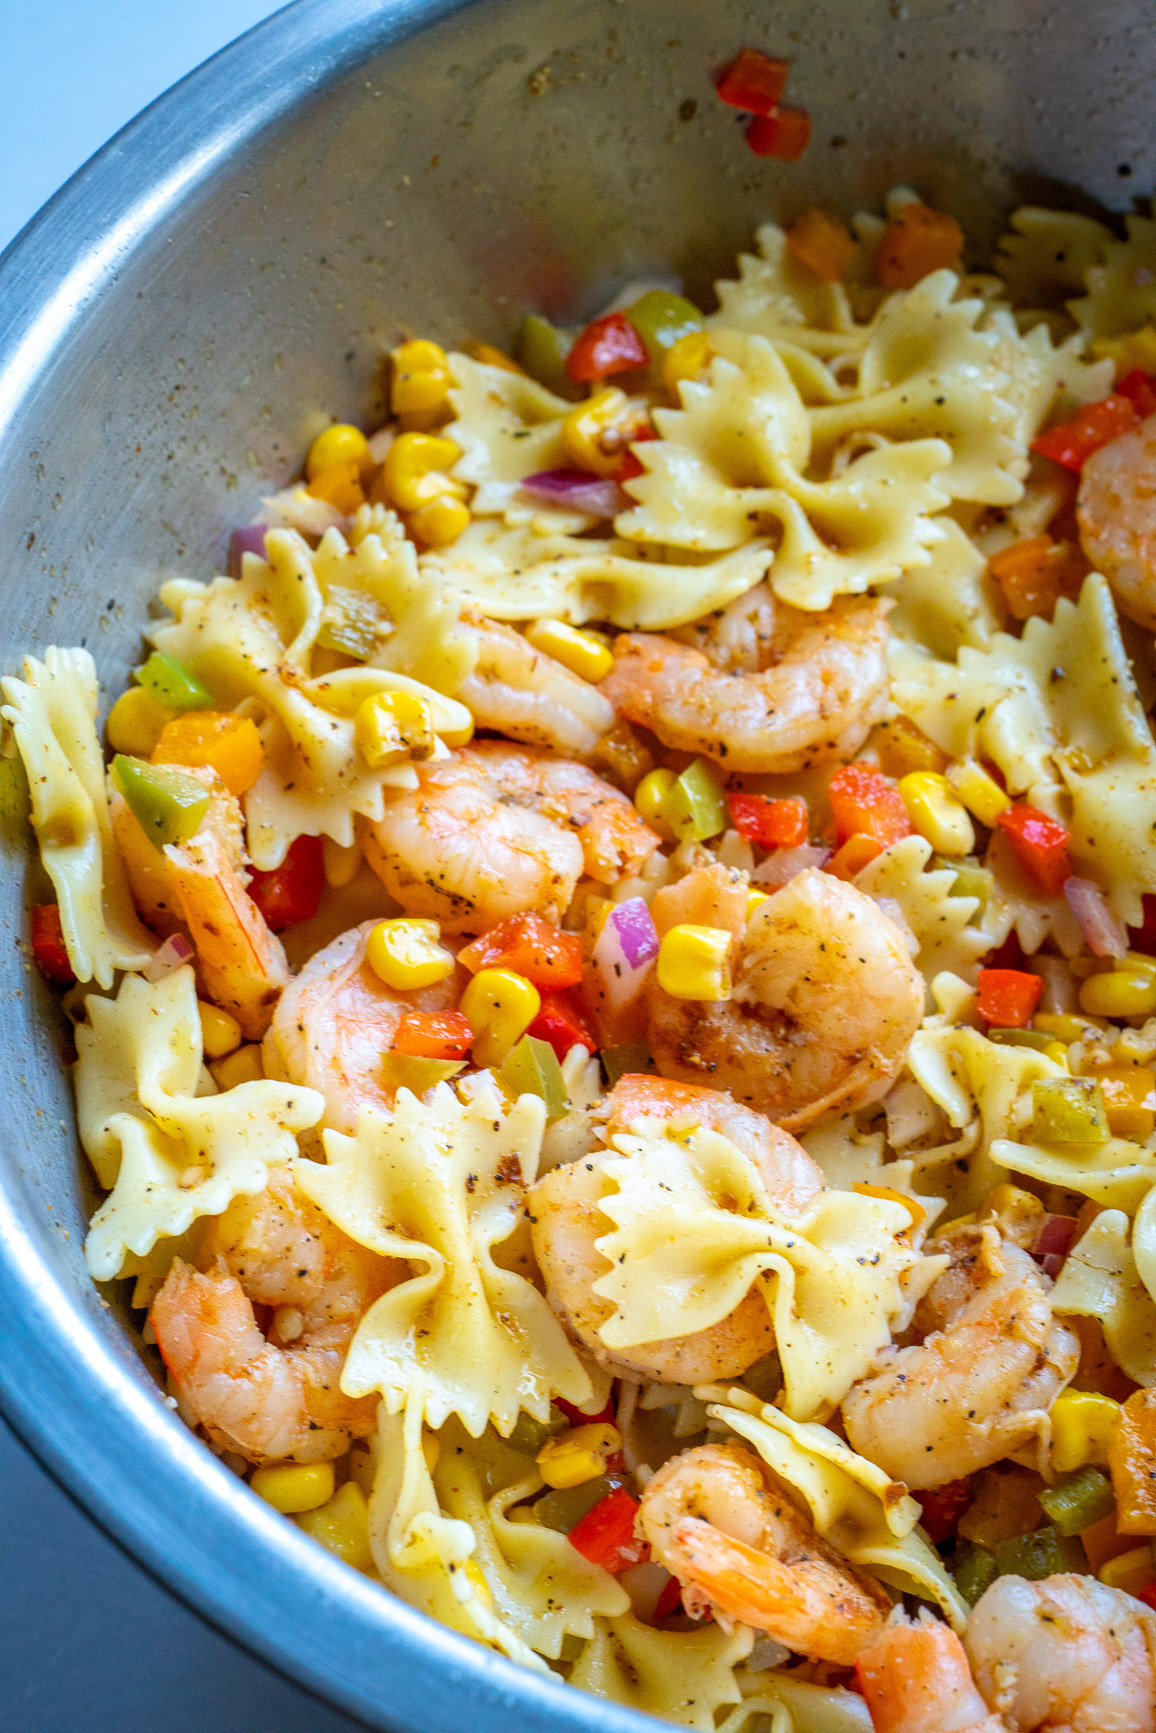 Shrimp fajita salad in a large bowl